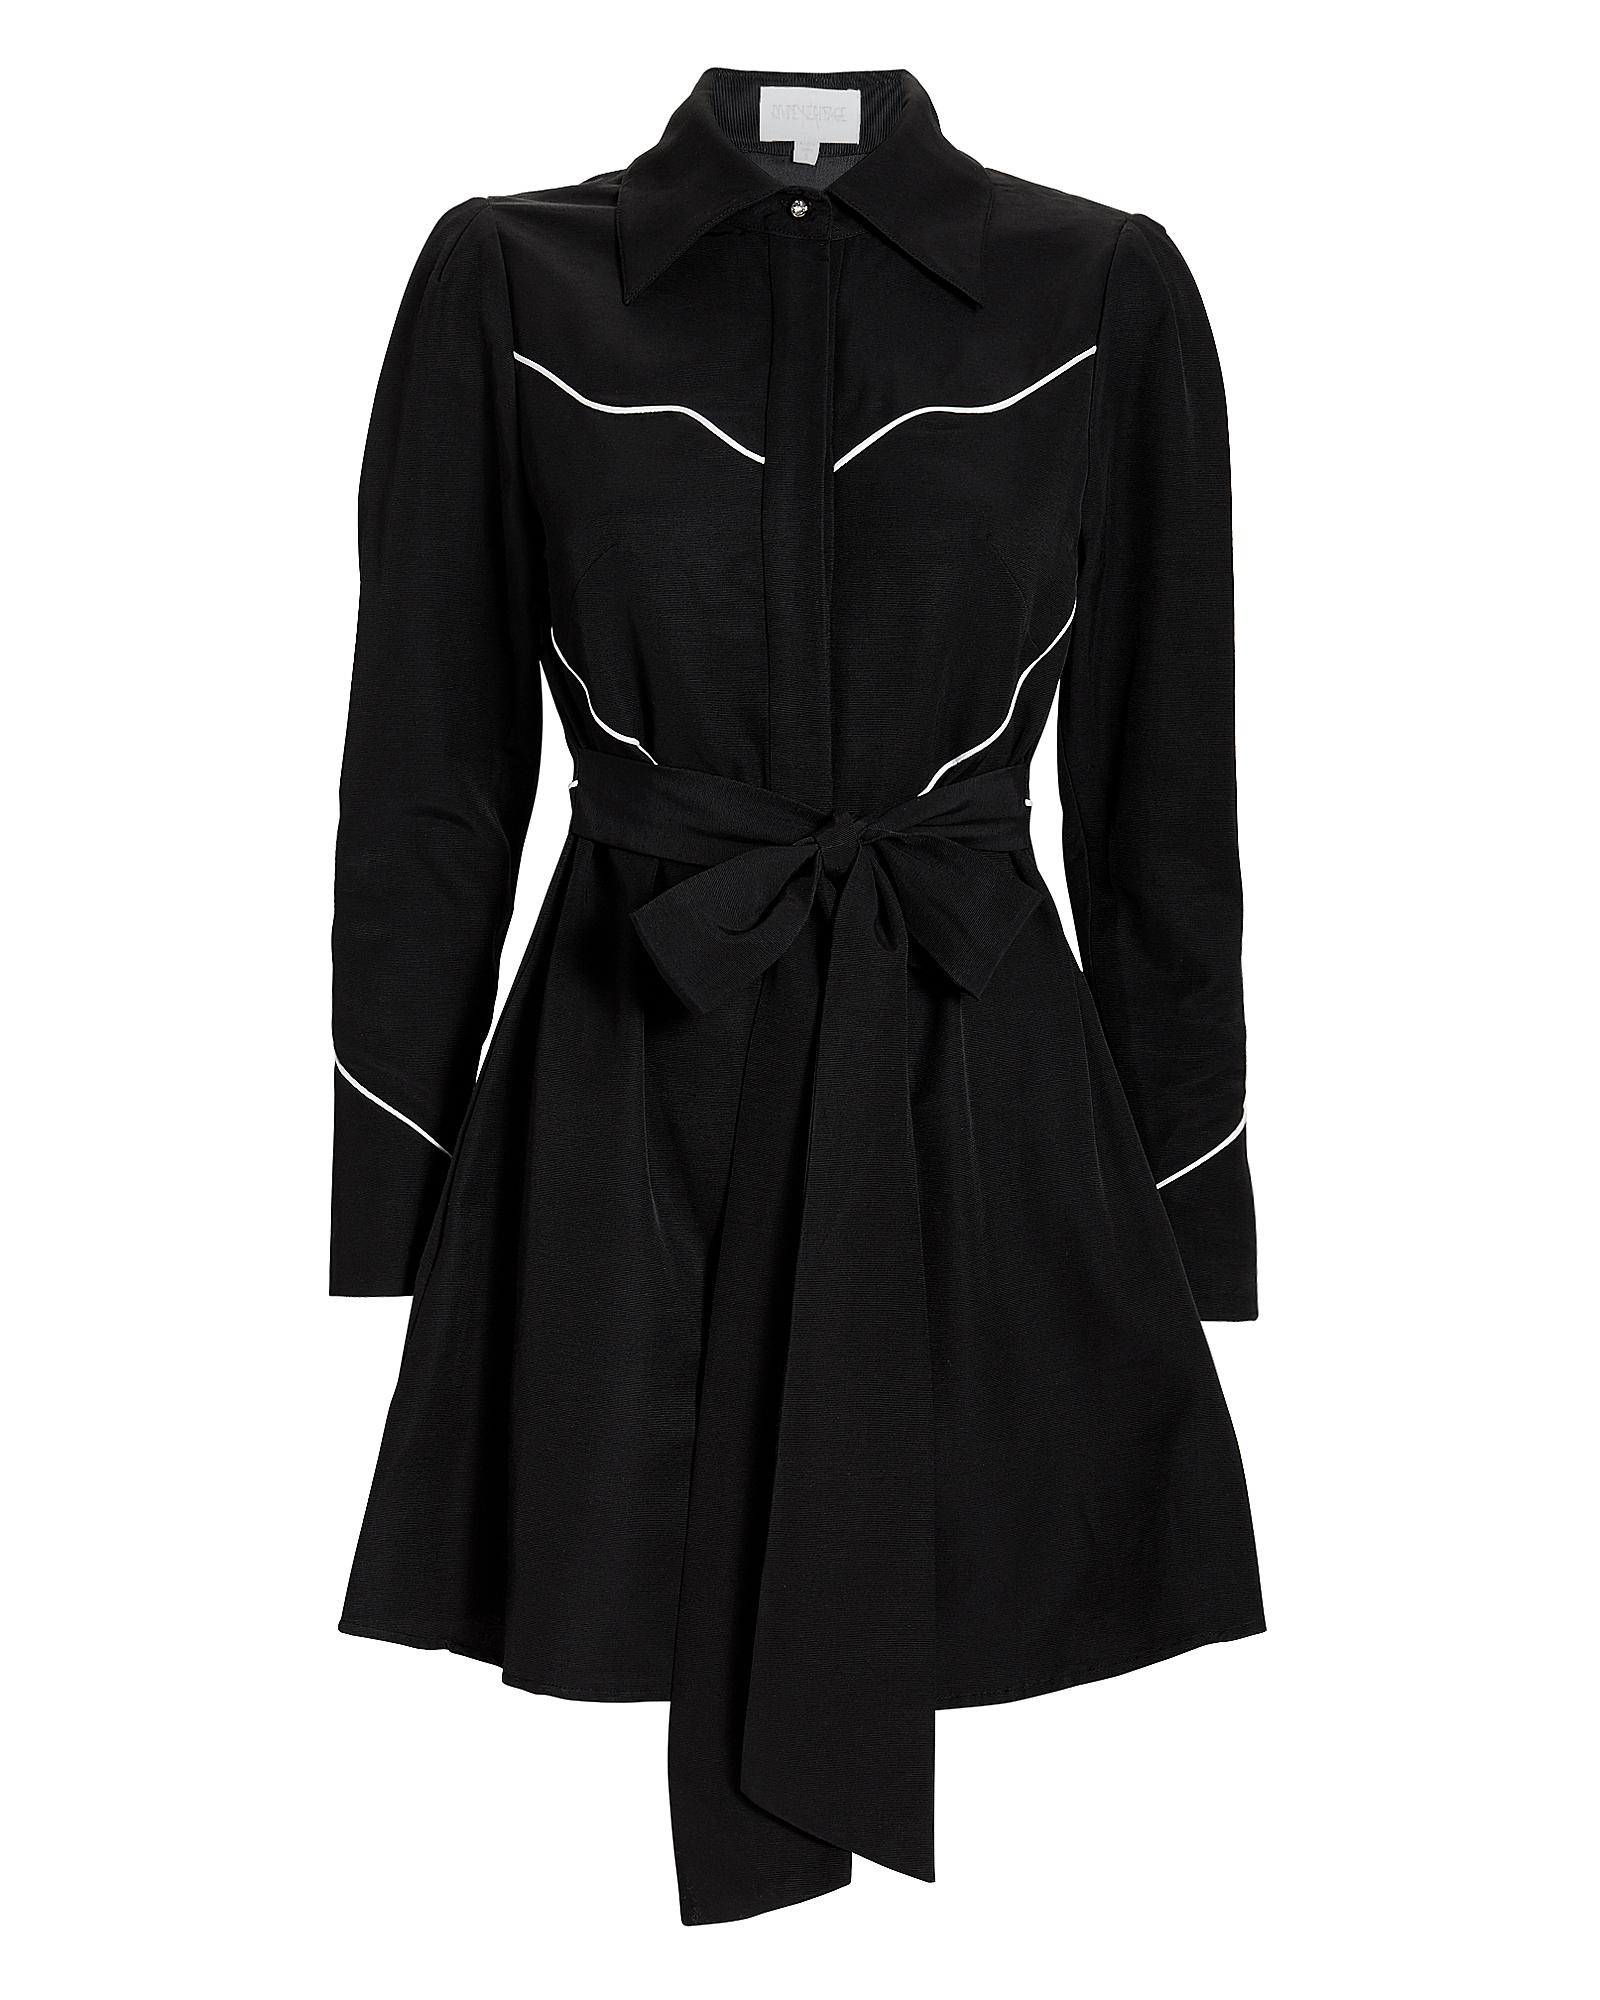 DEVINE HERITAGE Divine Heritage Western Ini Dress Black